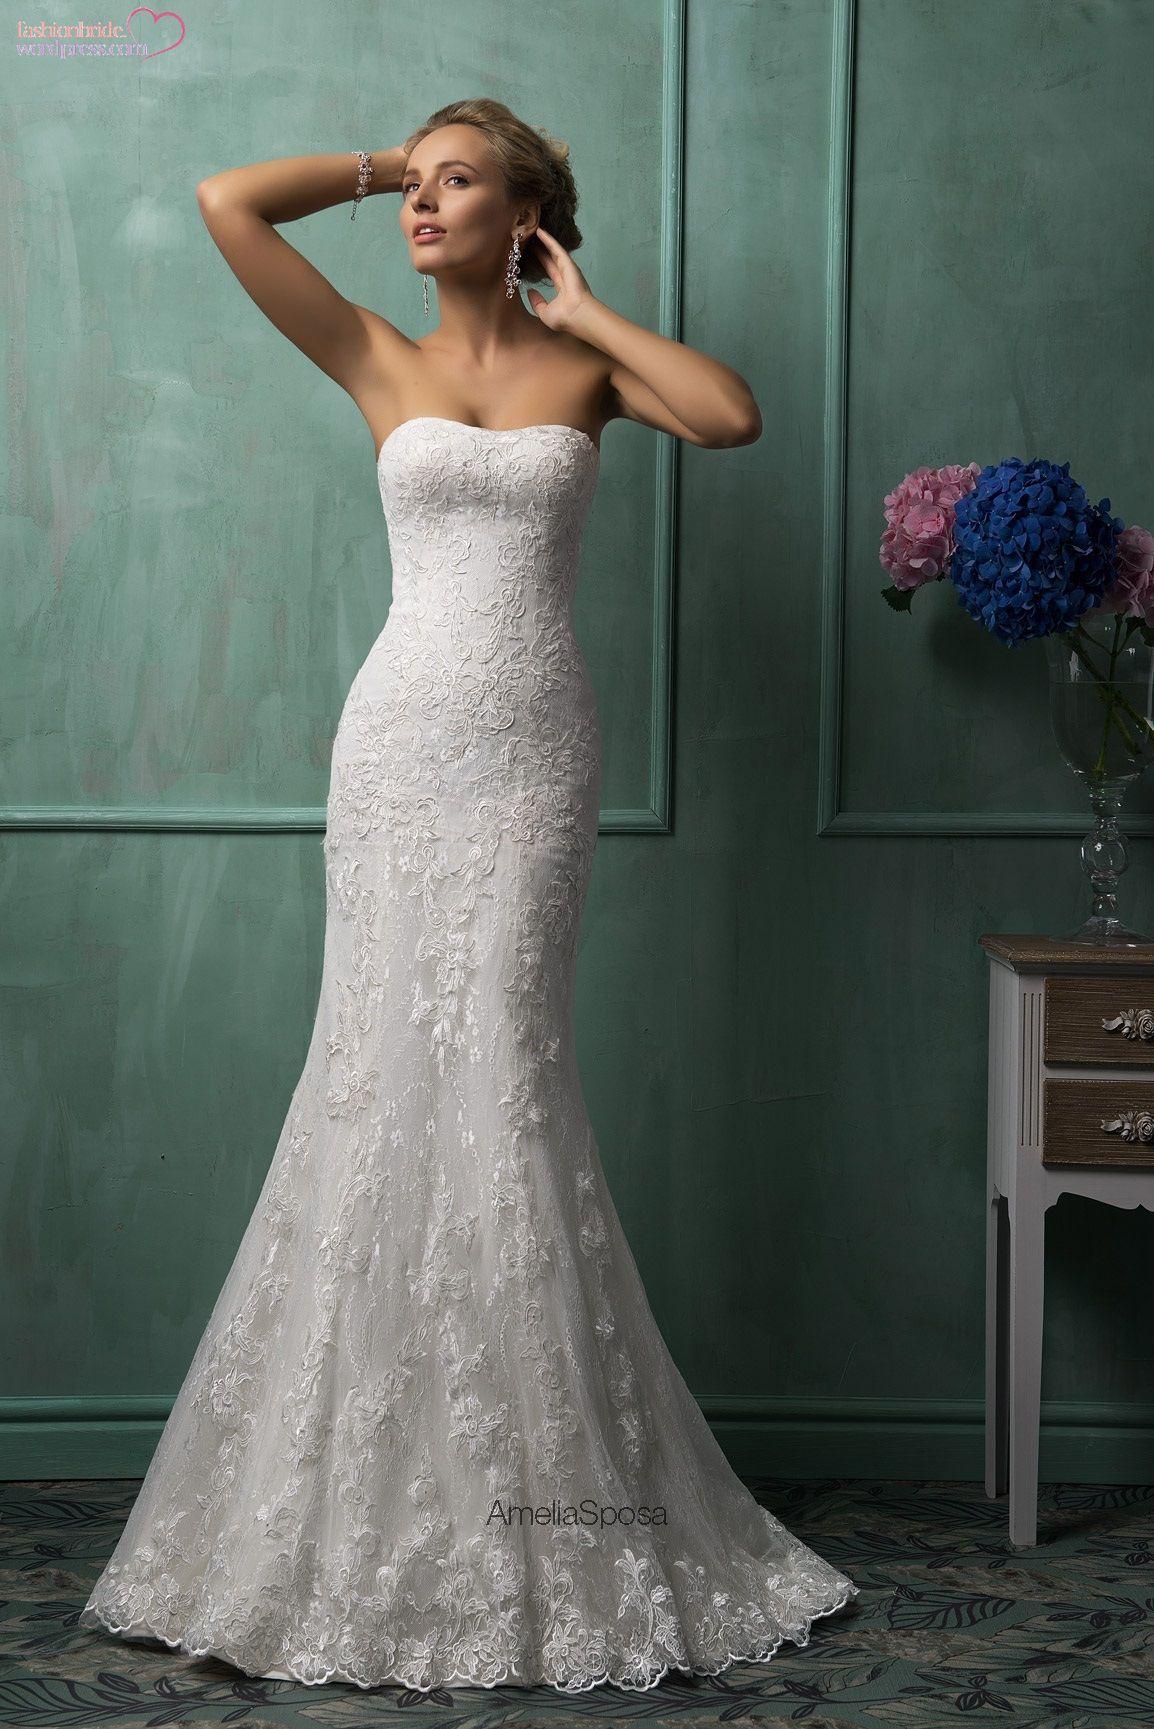 amelia-2014-spring-bridal-70.jpg 1,154×1,729 pixels | wedding wishes ...